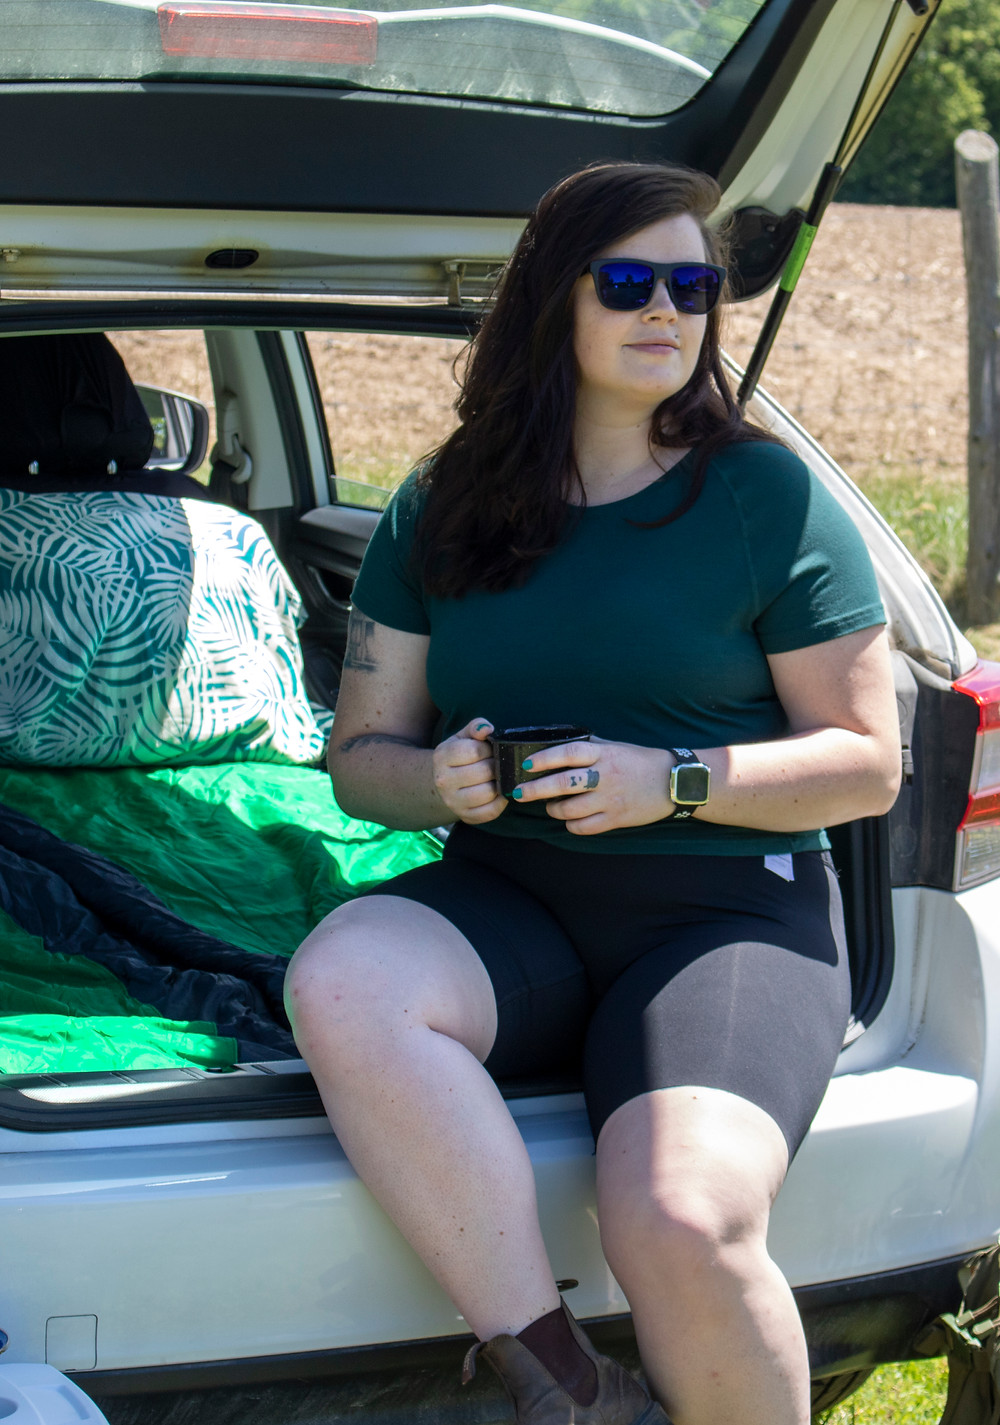 Woman sitting on the back of a Subaru Impreza drinking coffee